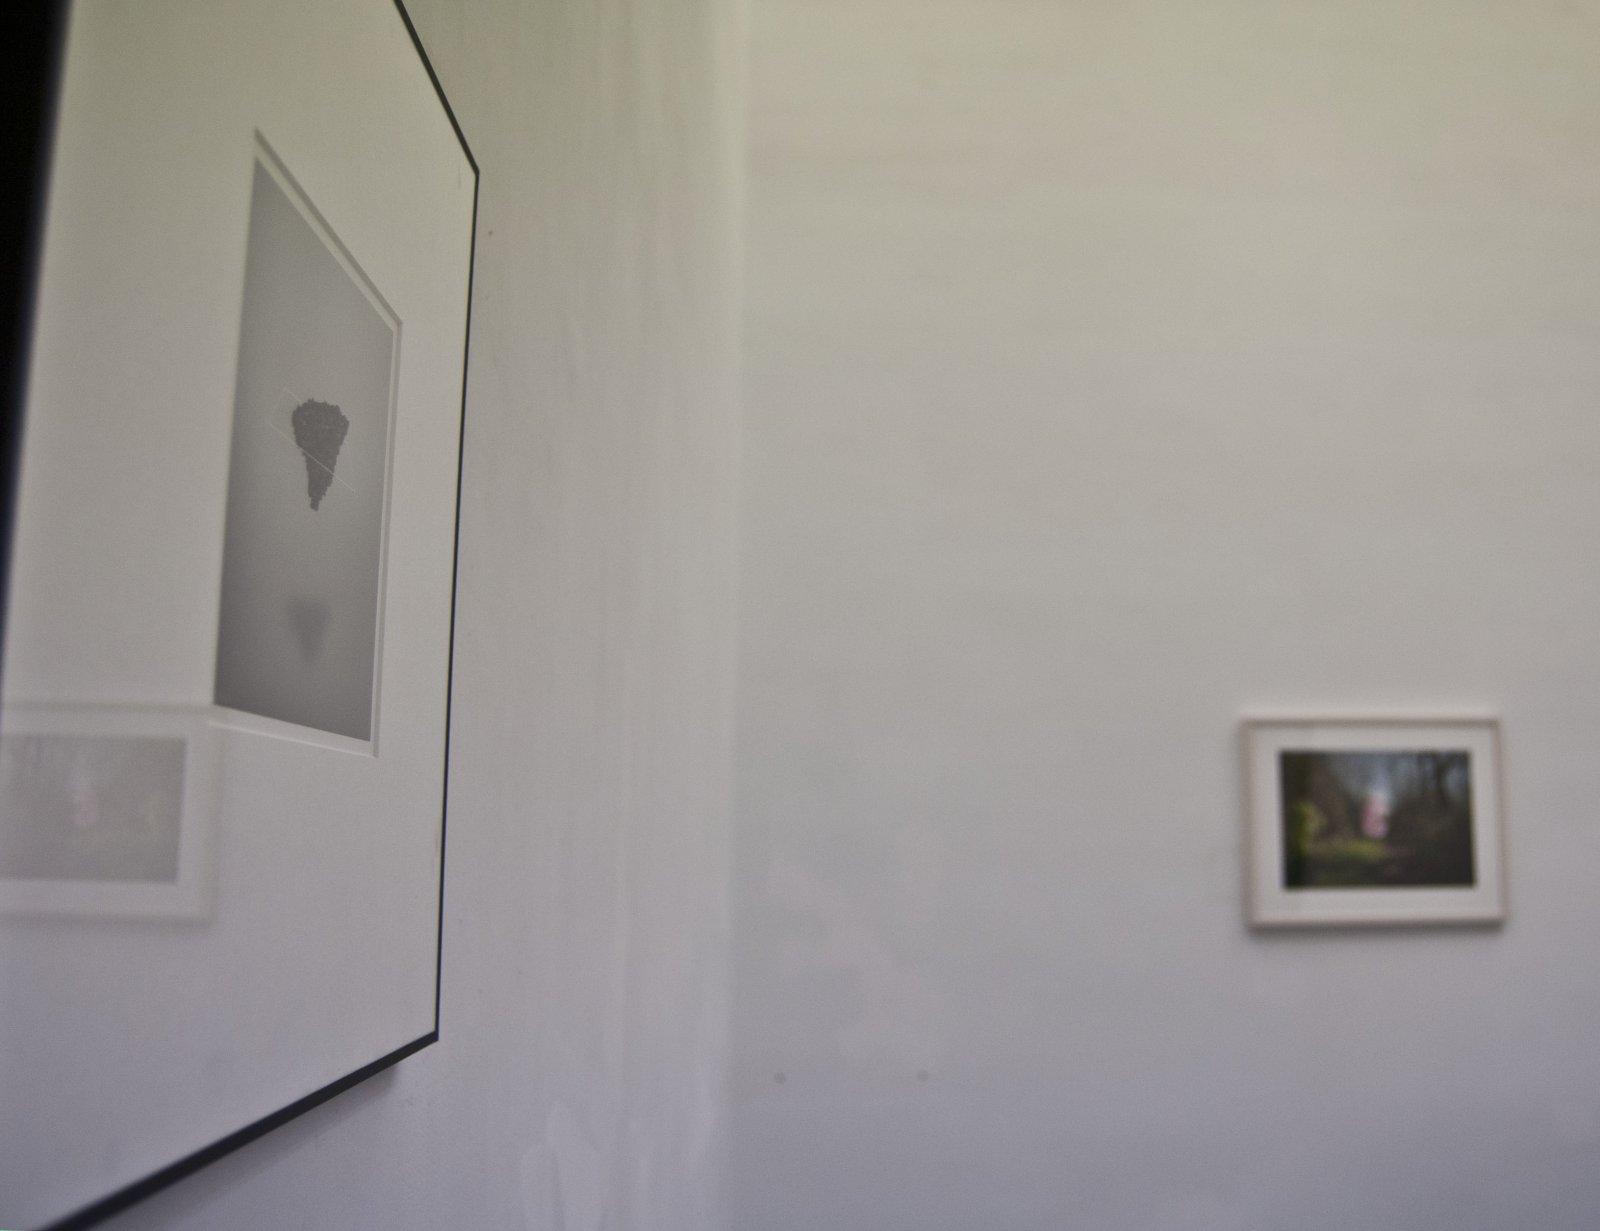 'Espacio gélido', de Julia Llerena. Entreacto 2014